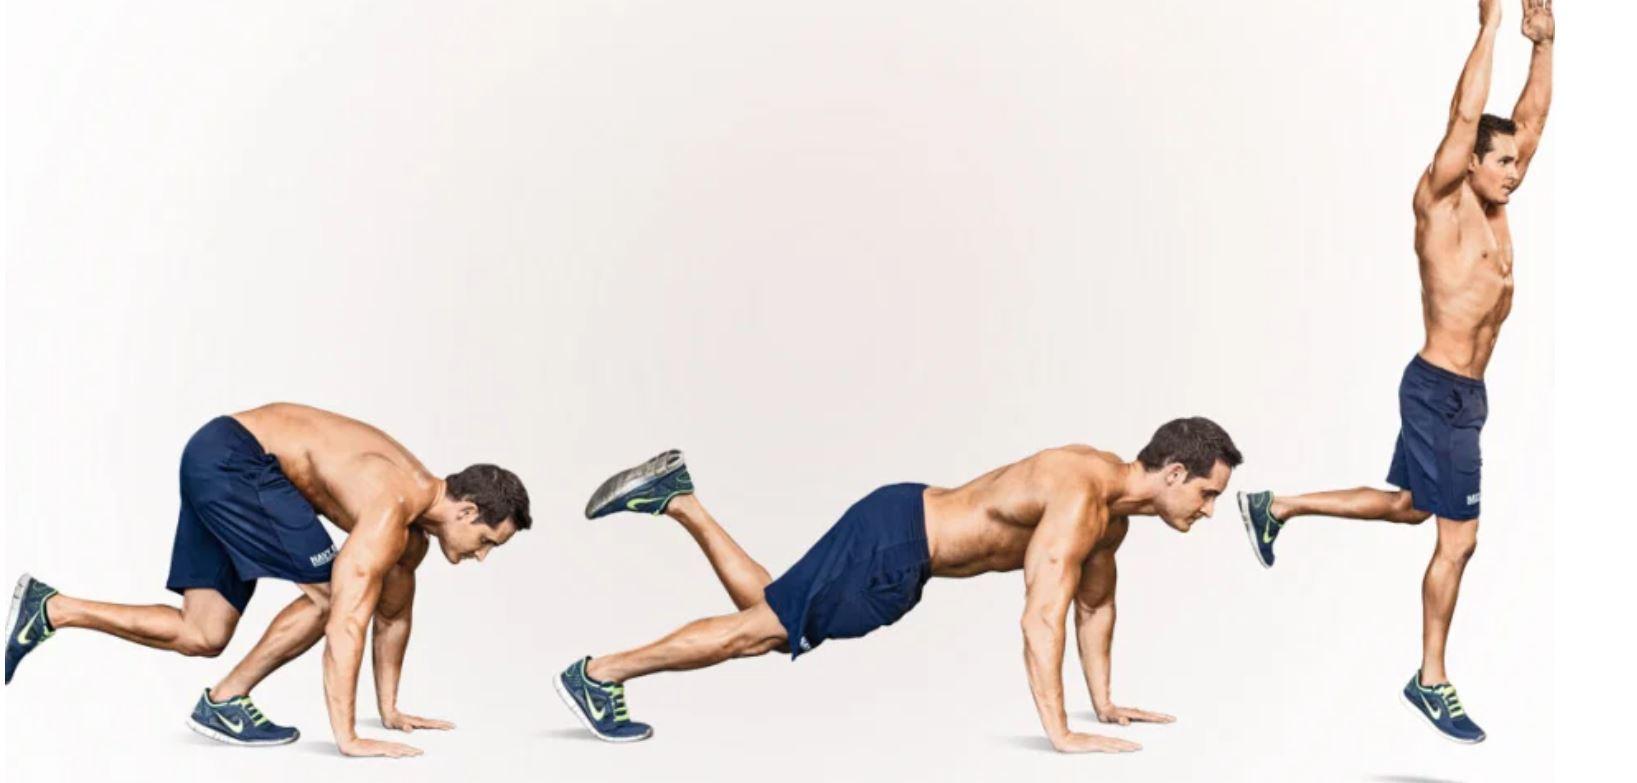 single leg burpee workout